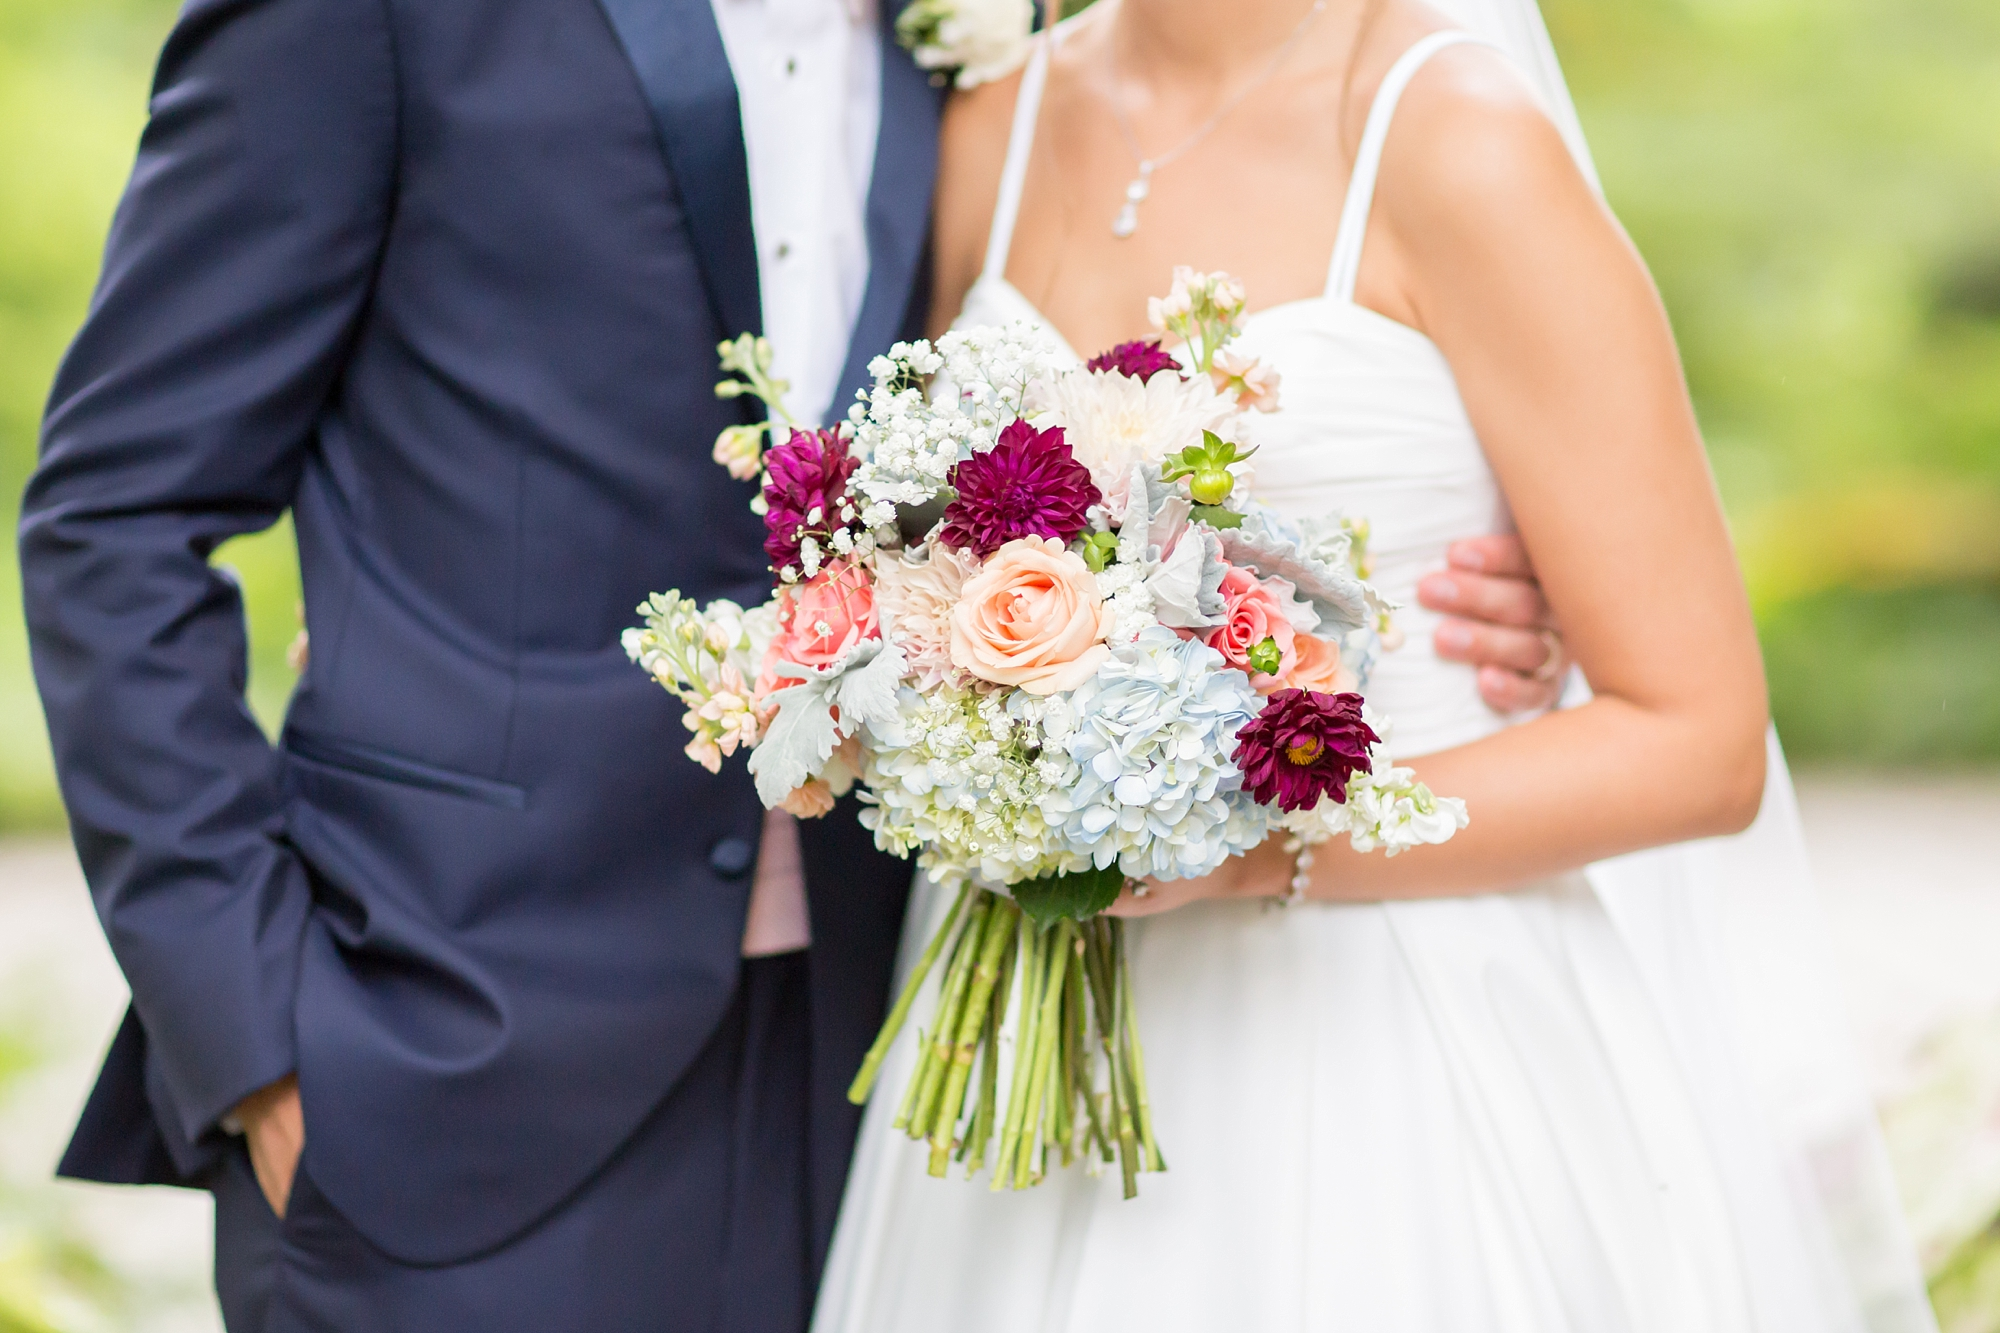 Russell 5-Bride & Groom Portraits-759_anna grace photography baltimore maryland wedding photographer elkridge furnace inn wedding photo.jpg